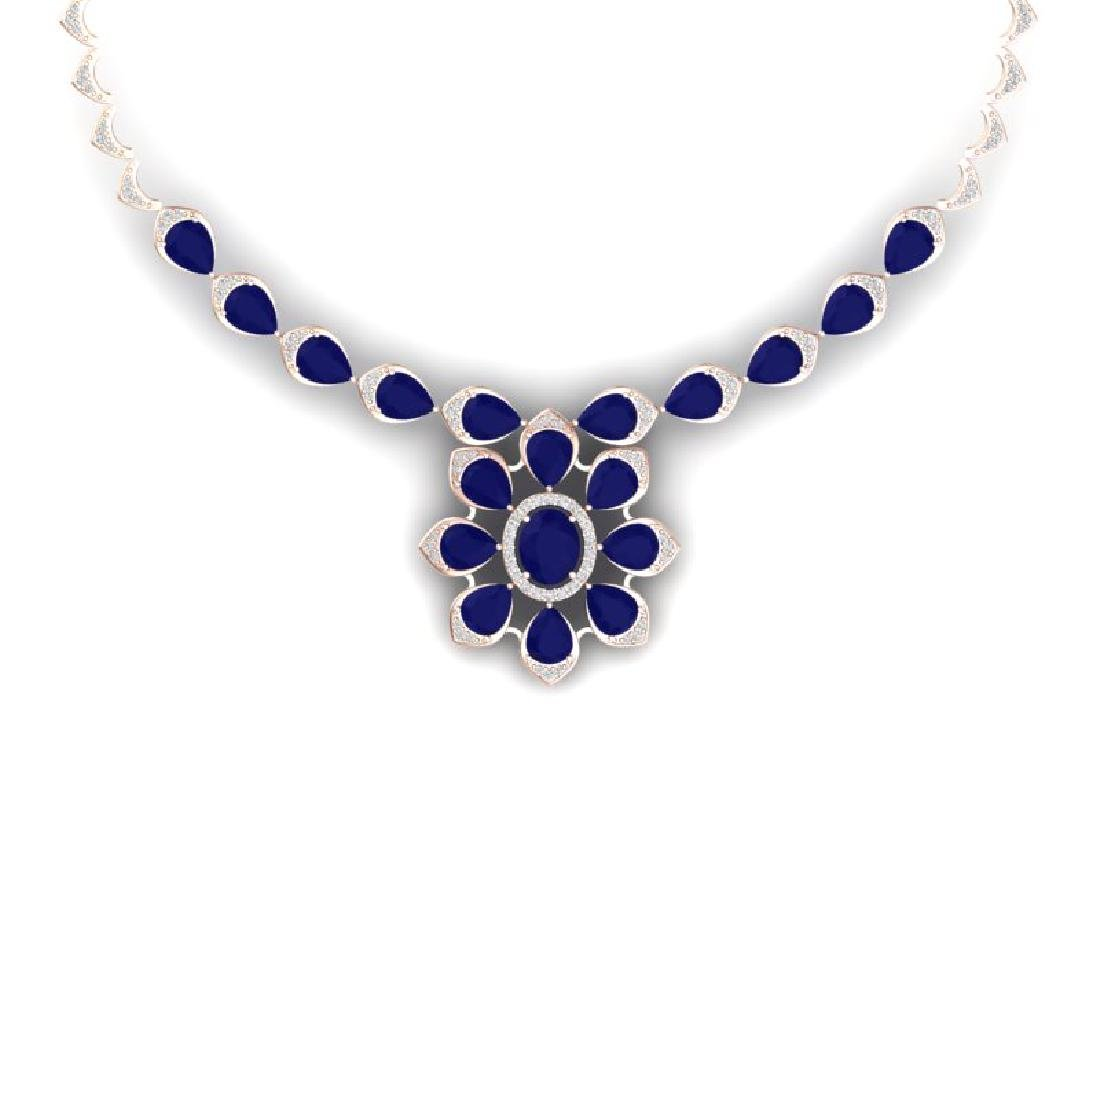 30.70 CTW Royalty Sapphire & VS Diamond Necklace 18K